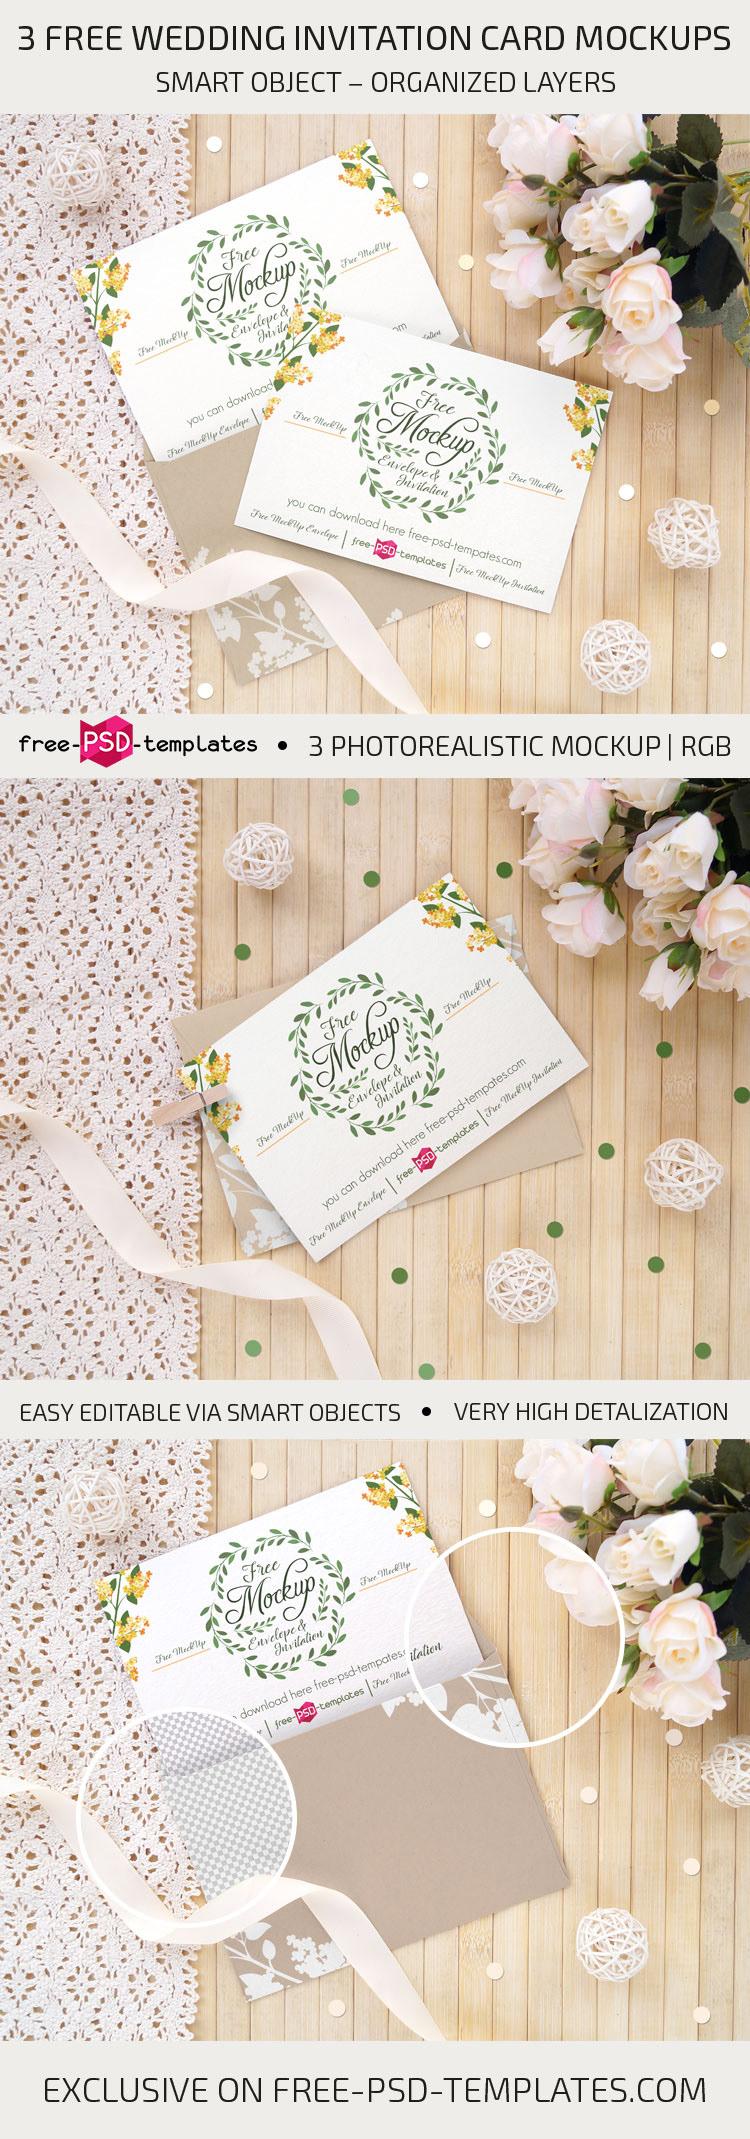 3 Free Wedding Invitation Card Mockups On Behance